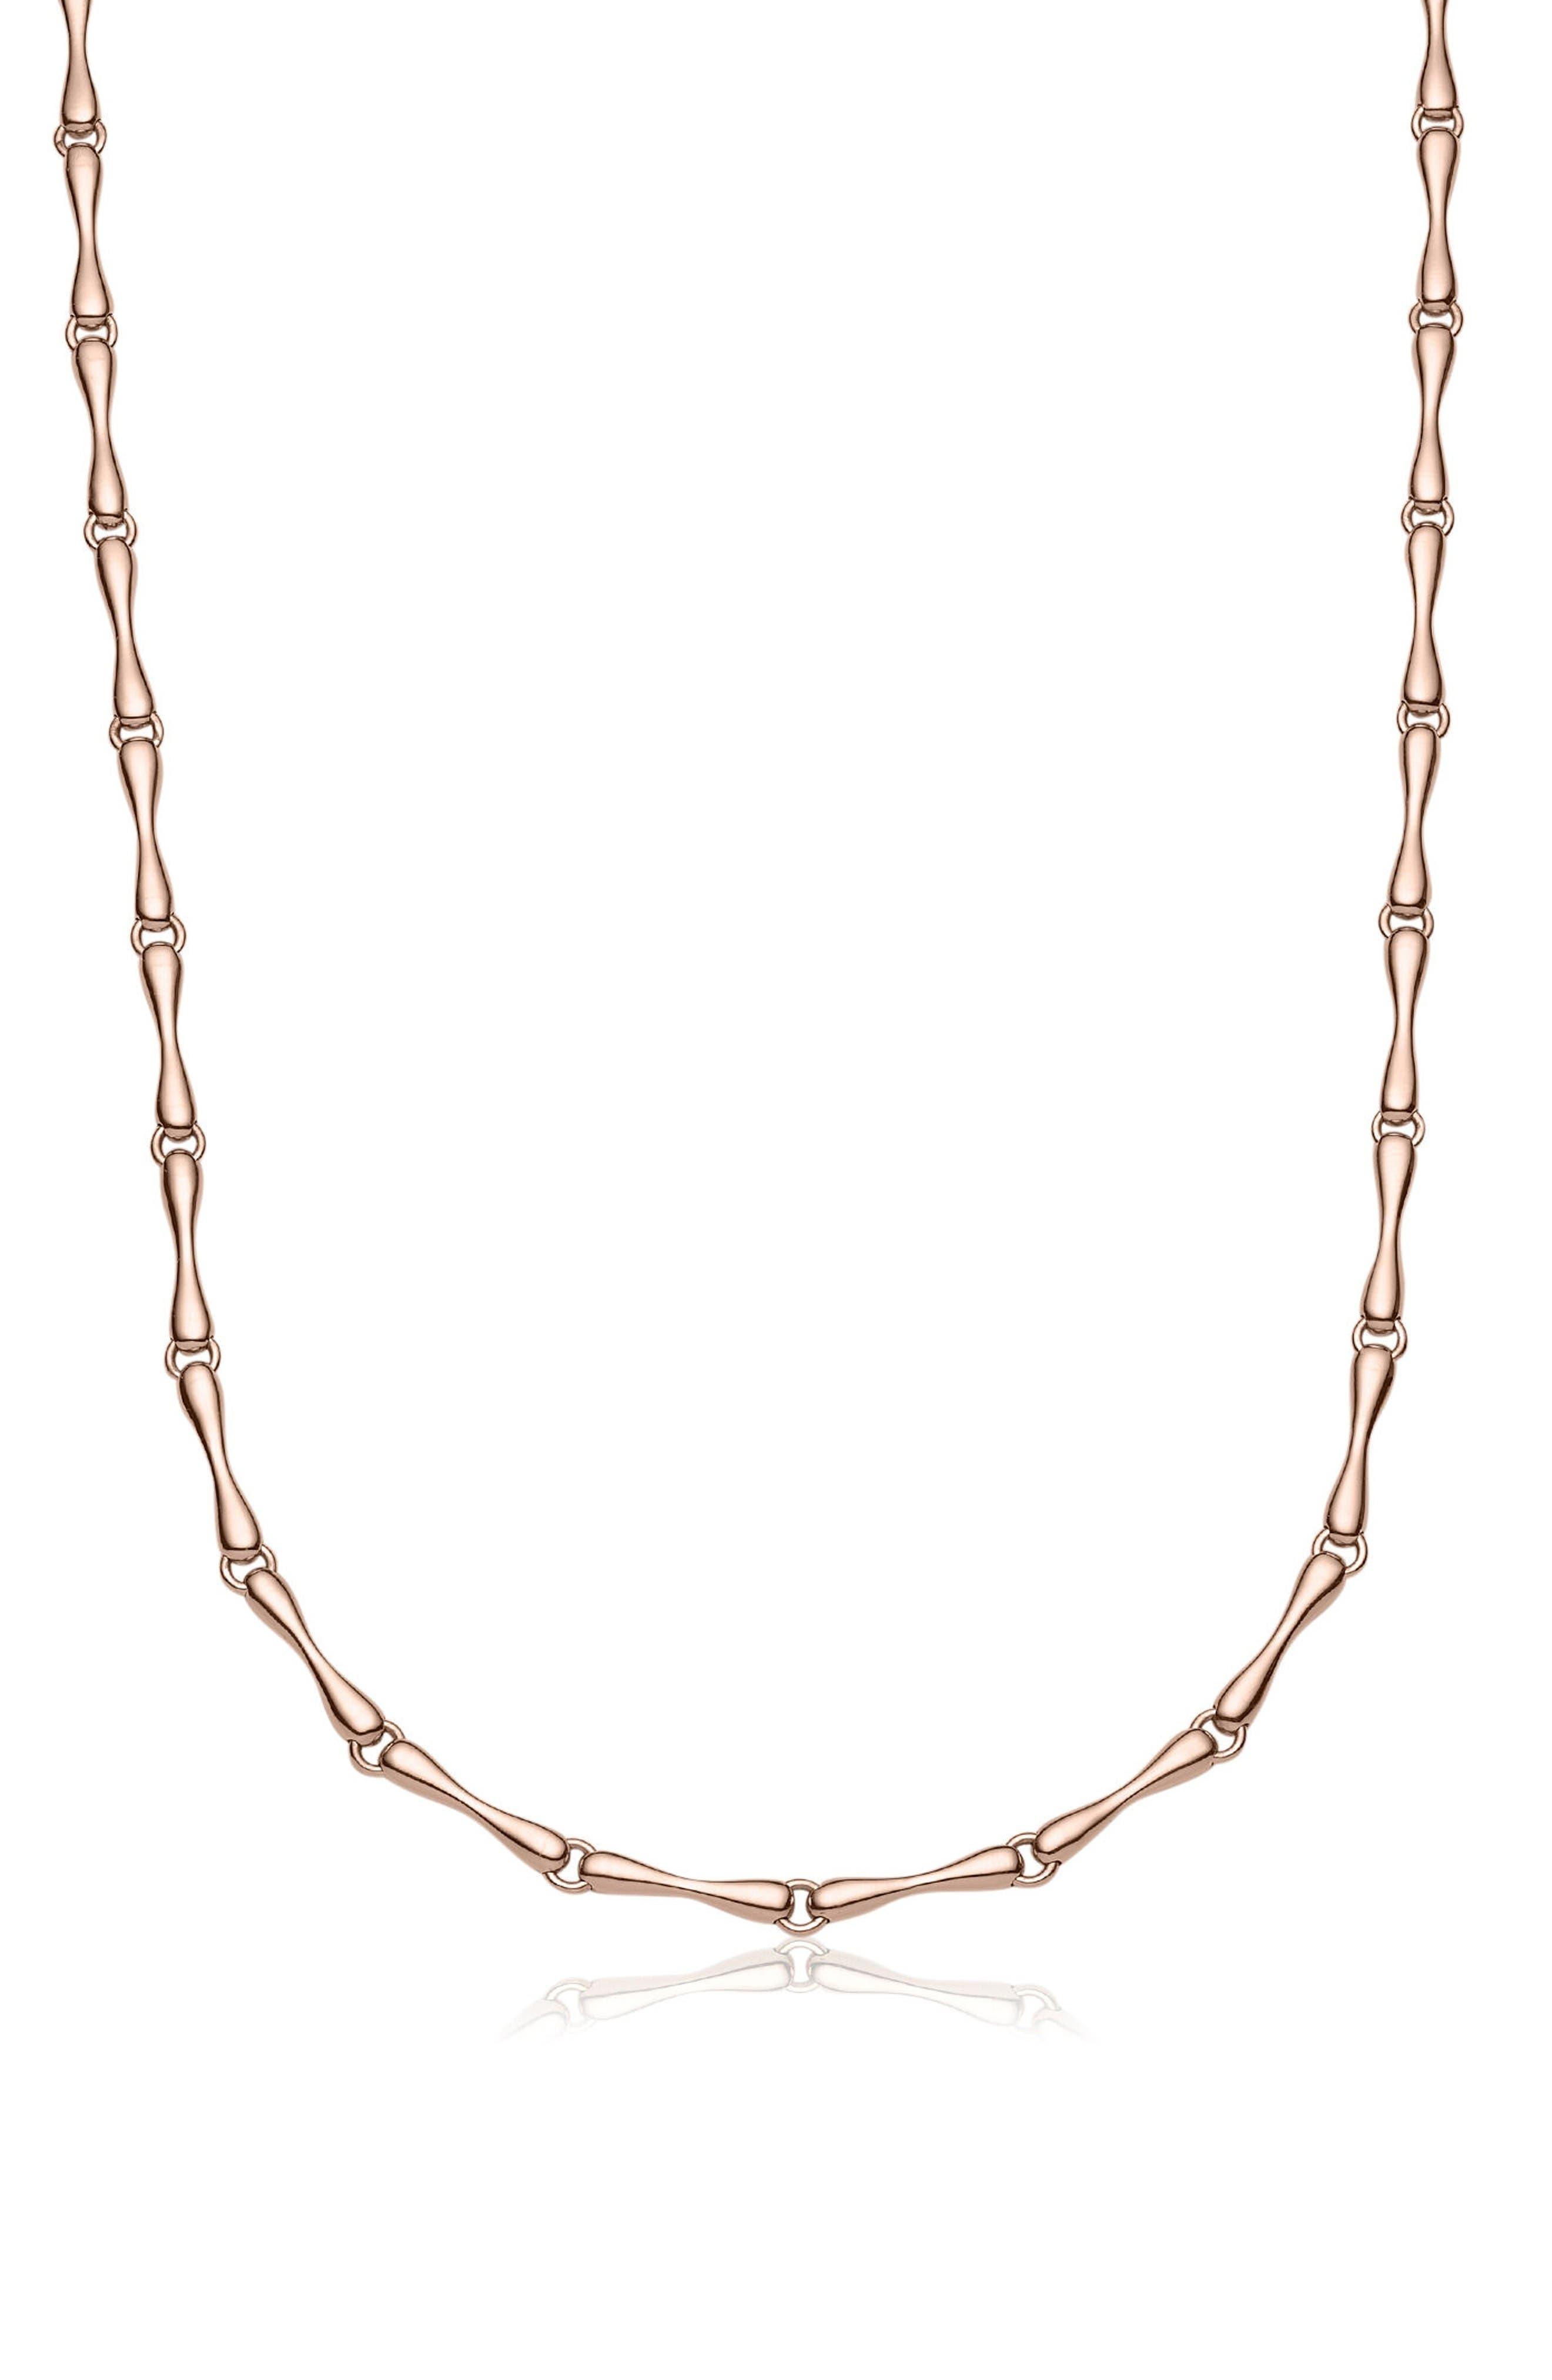 Main Image - Monica Vinader Nura Reef Chain Necklace